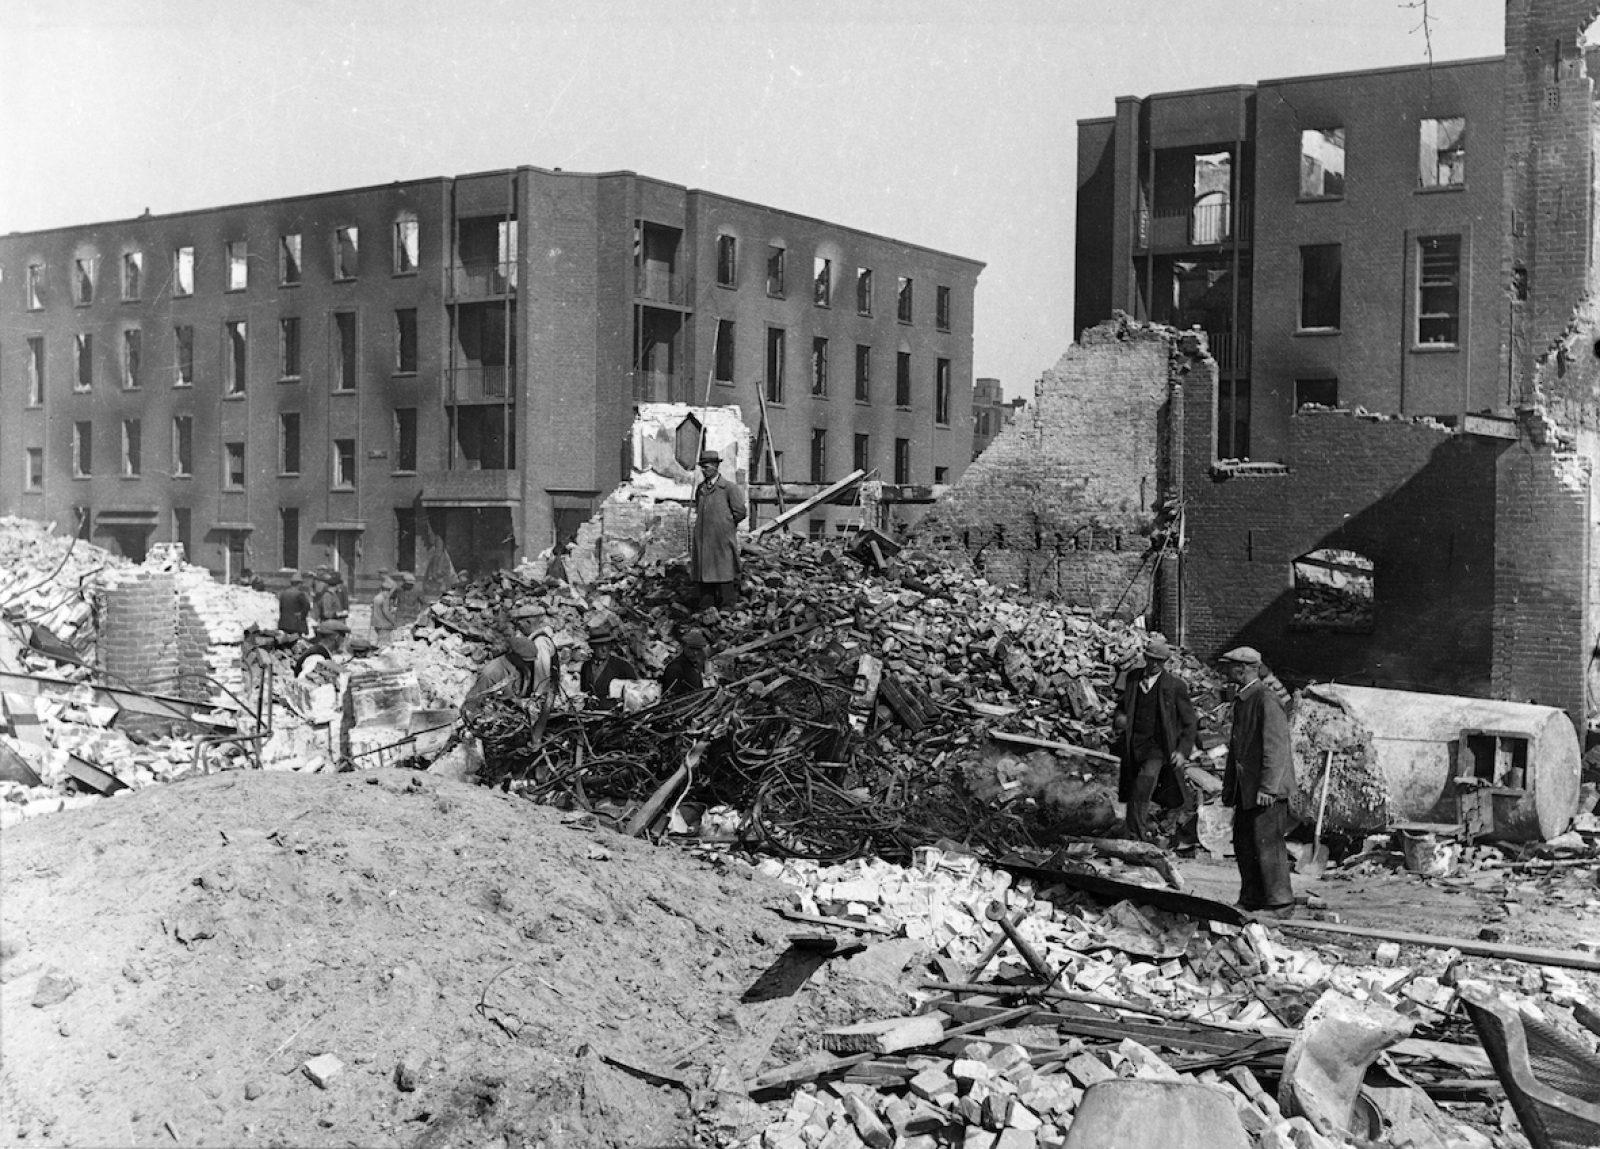 1943 zomer anoniem Gijsingstraat NL Rt SA 4100 XXXIII 632 00 04 13 01